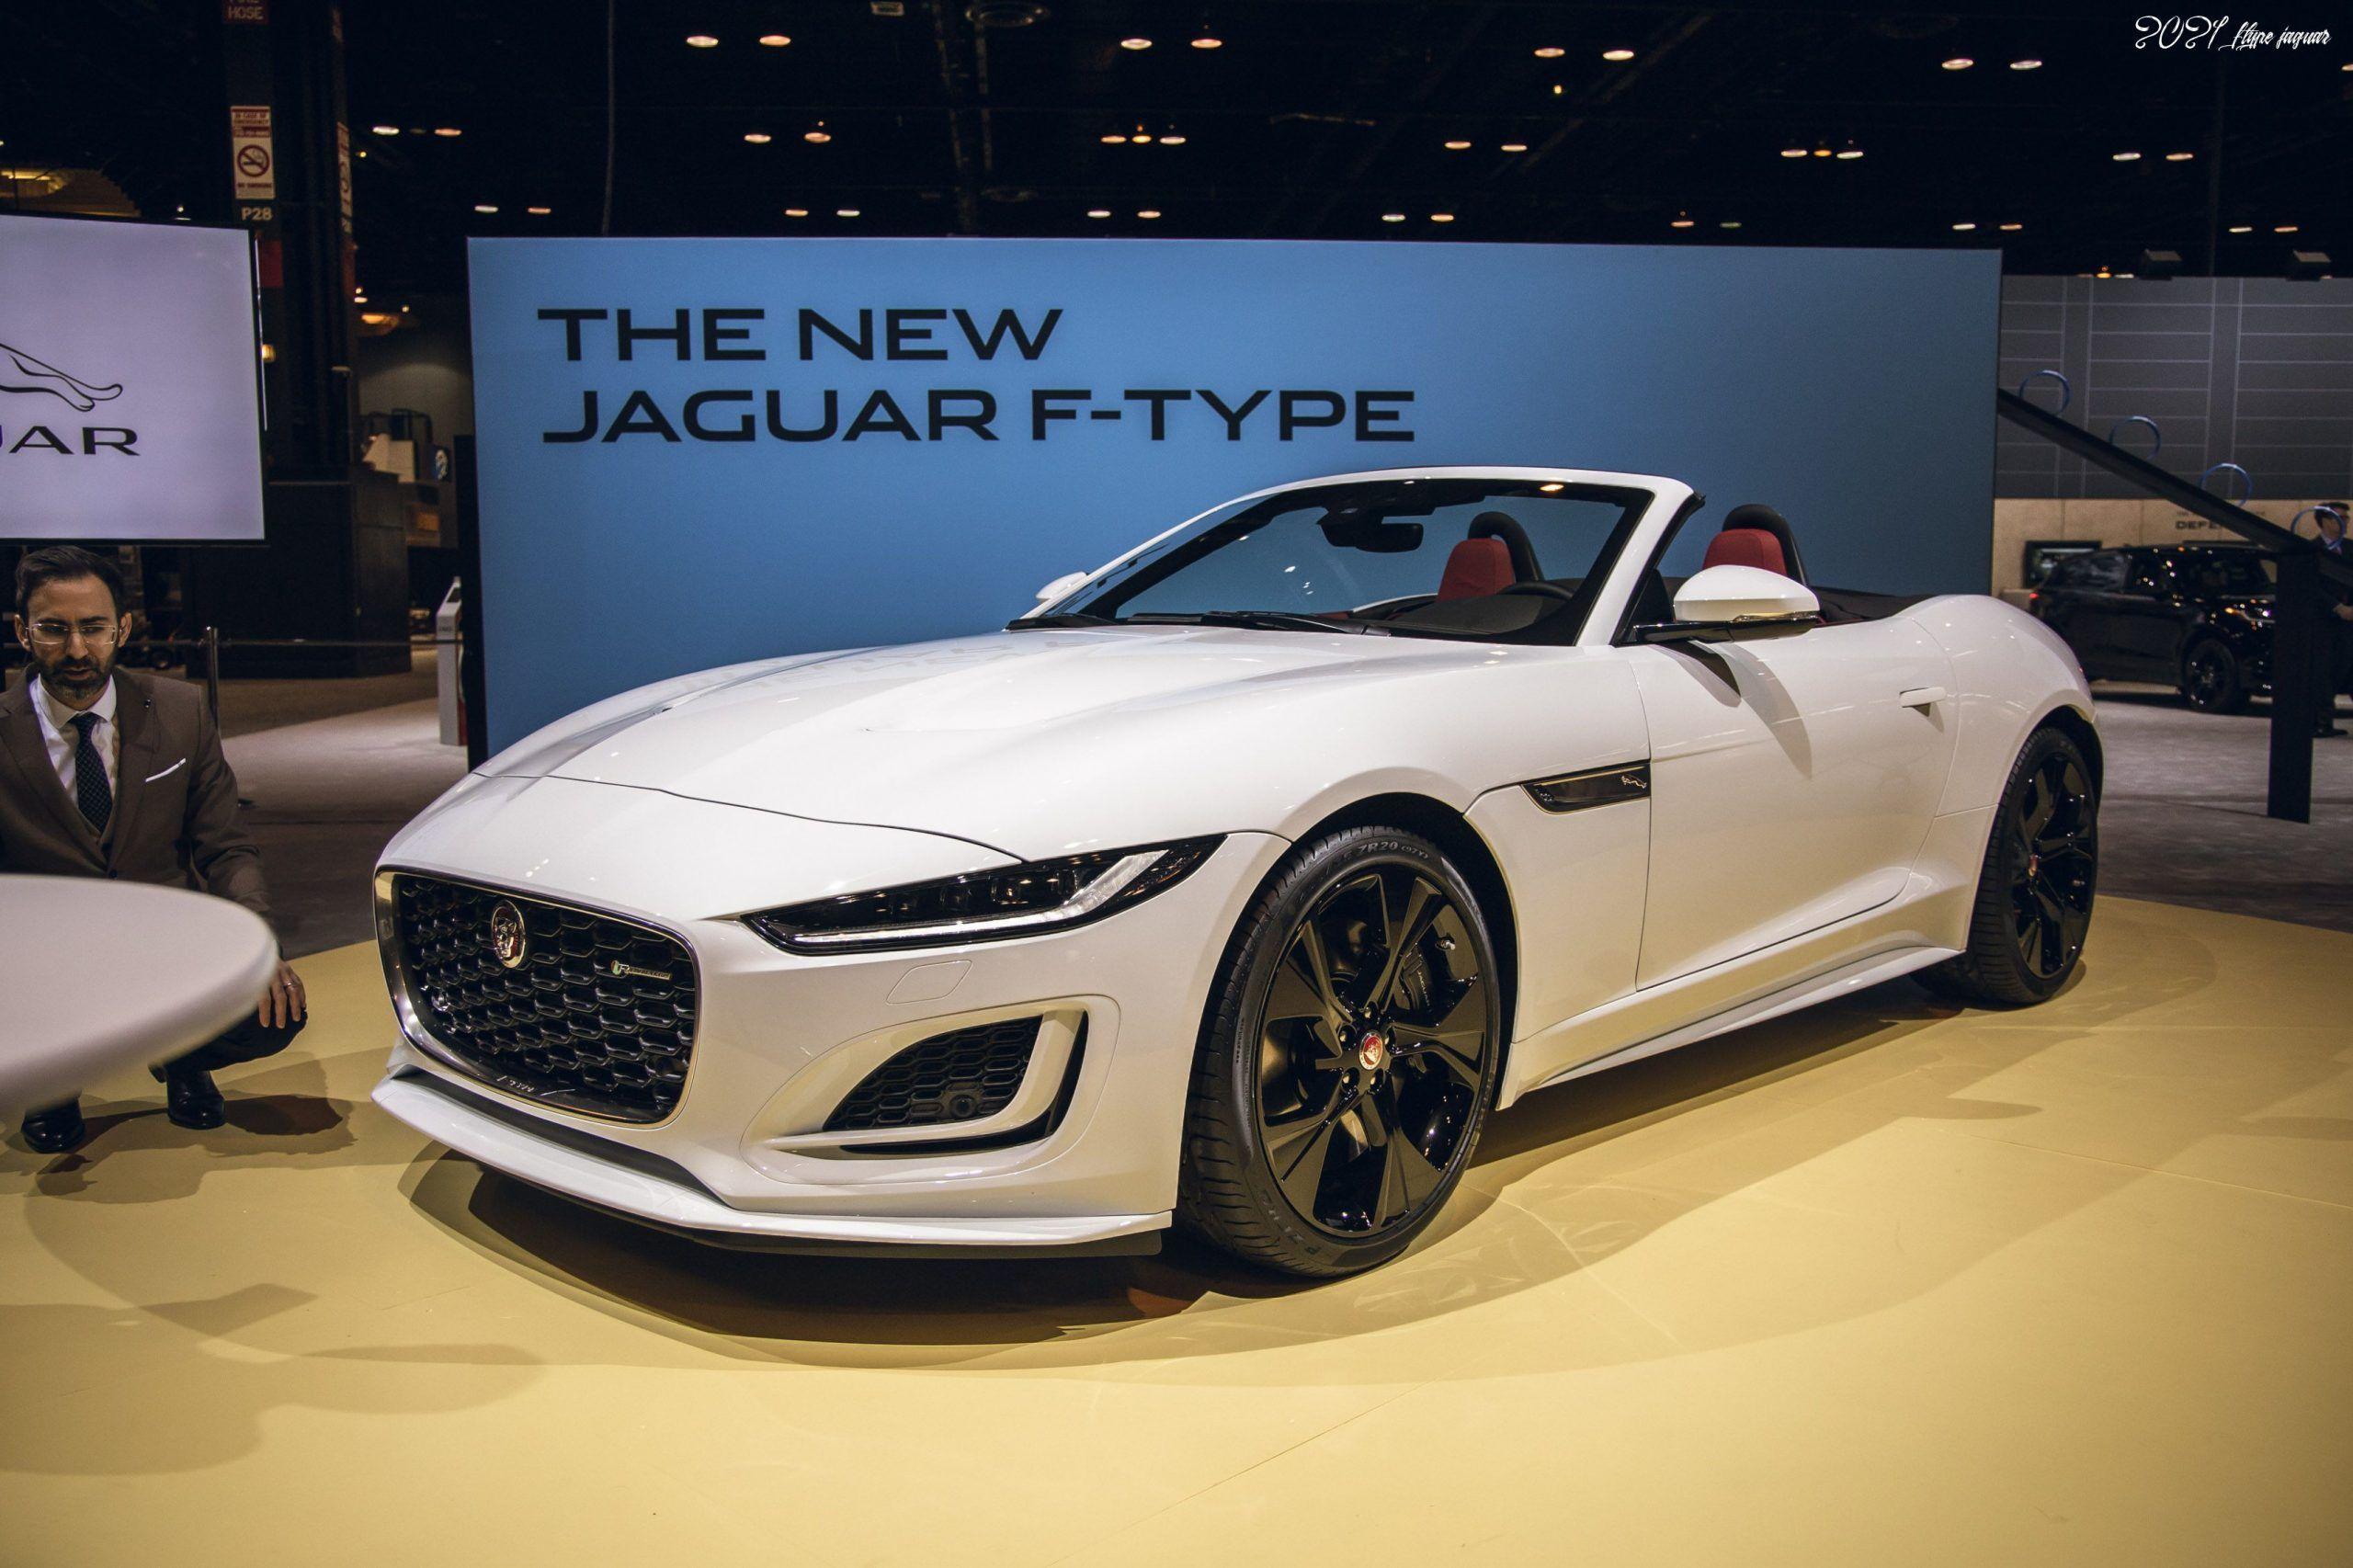 2021 F Type Jaguar Spy Shoot In 2020 New Jaguar F Type Jaguar F Type Jaguar Convertible